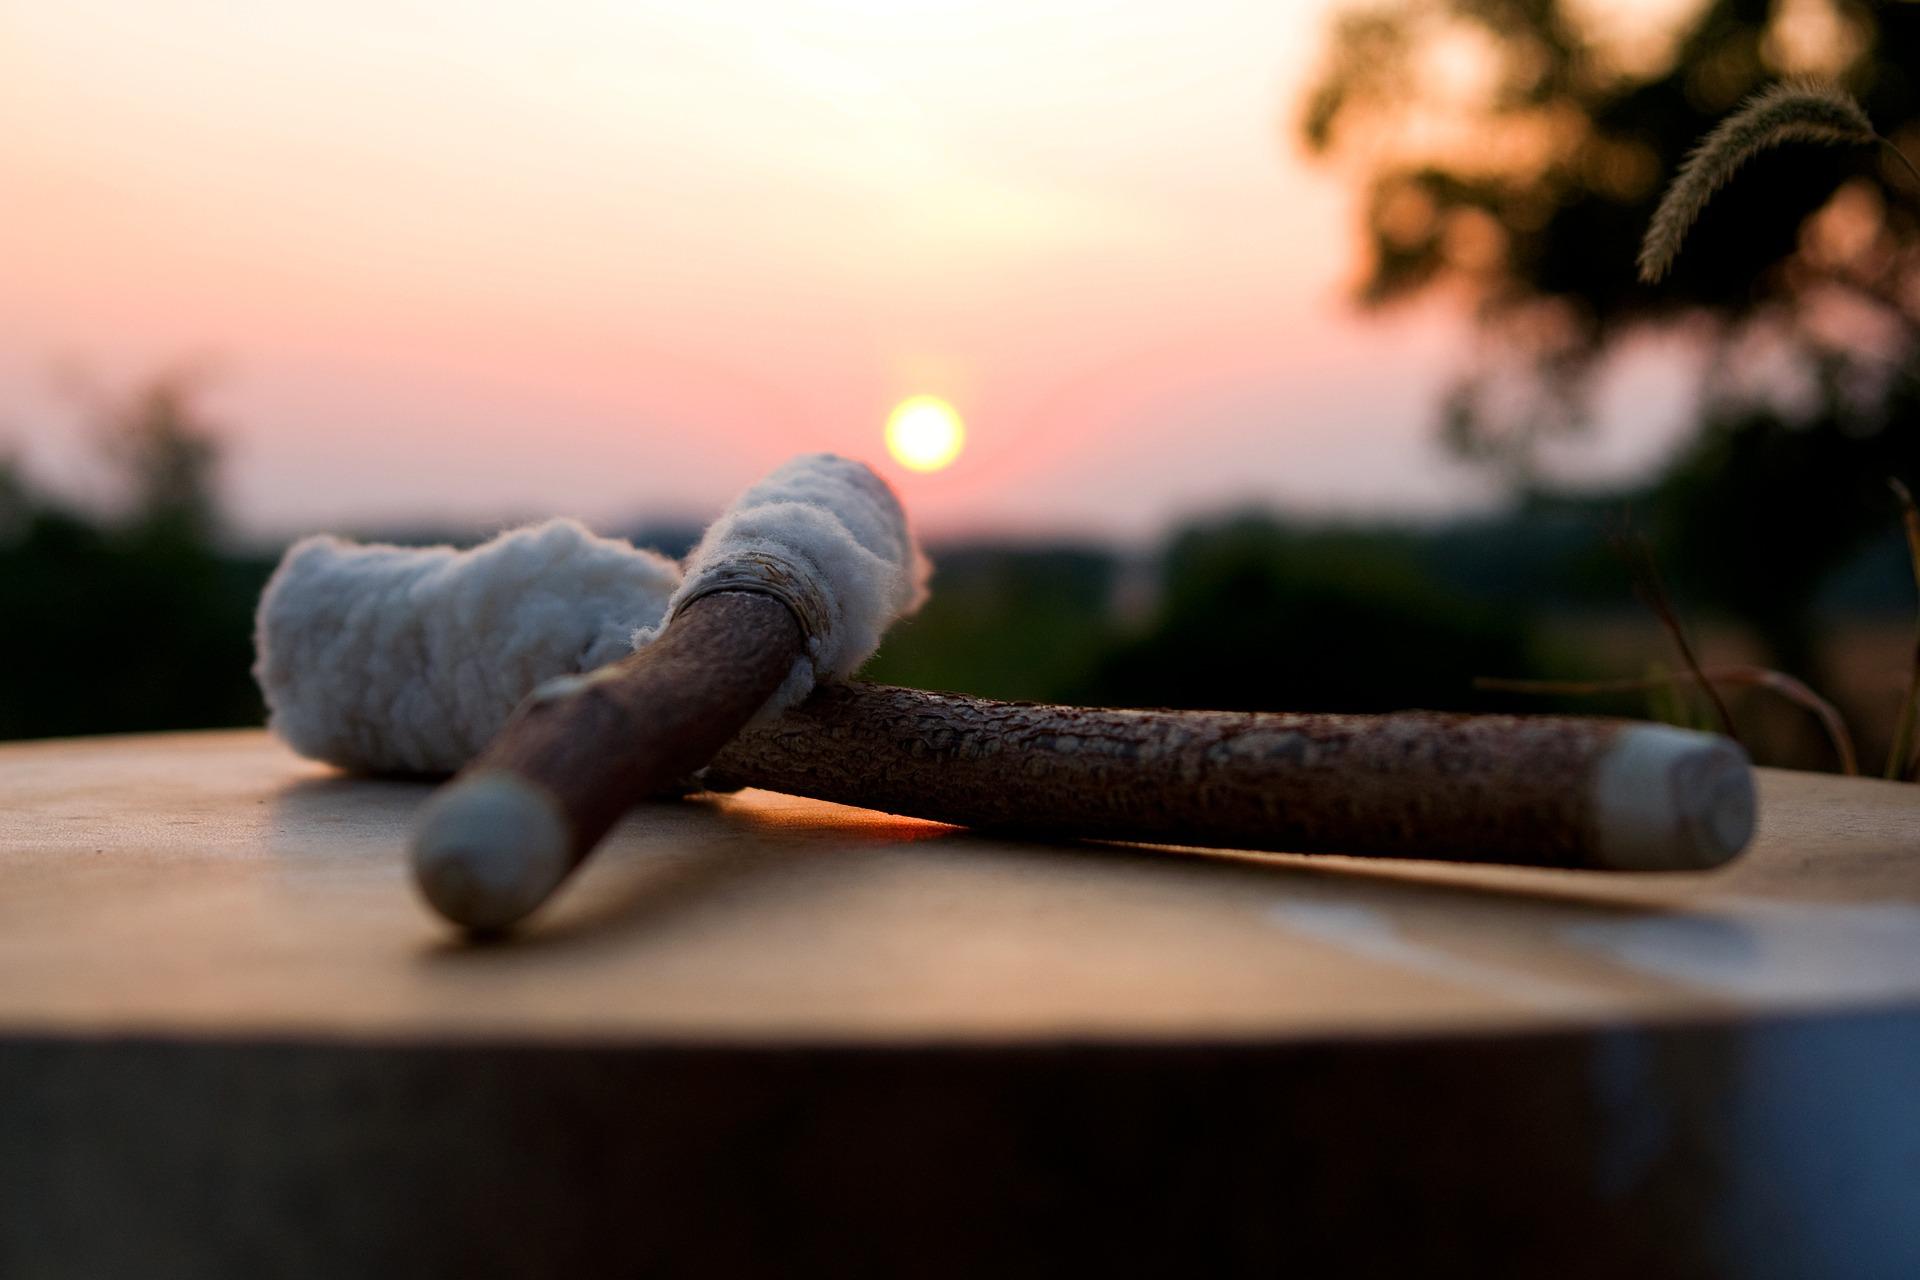 ritual-schamane-trommel